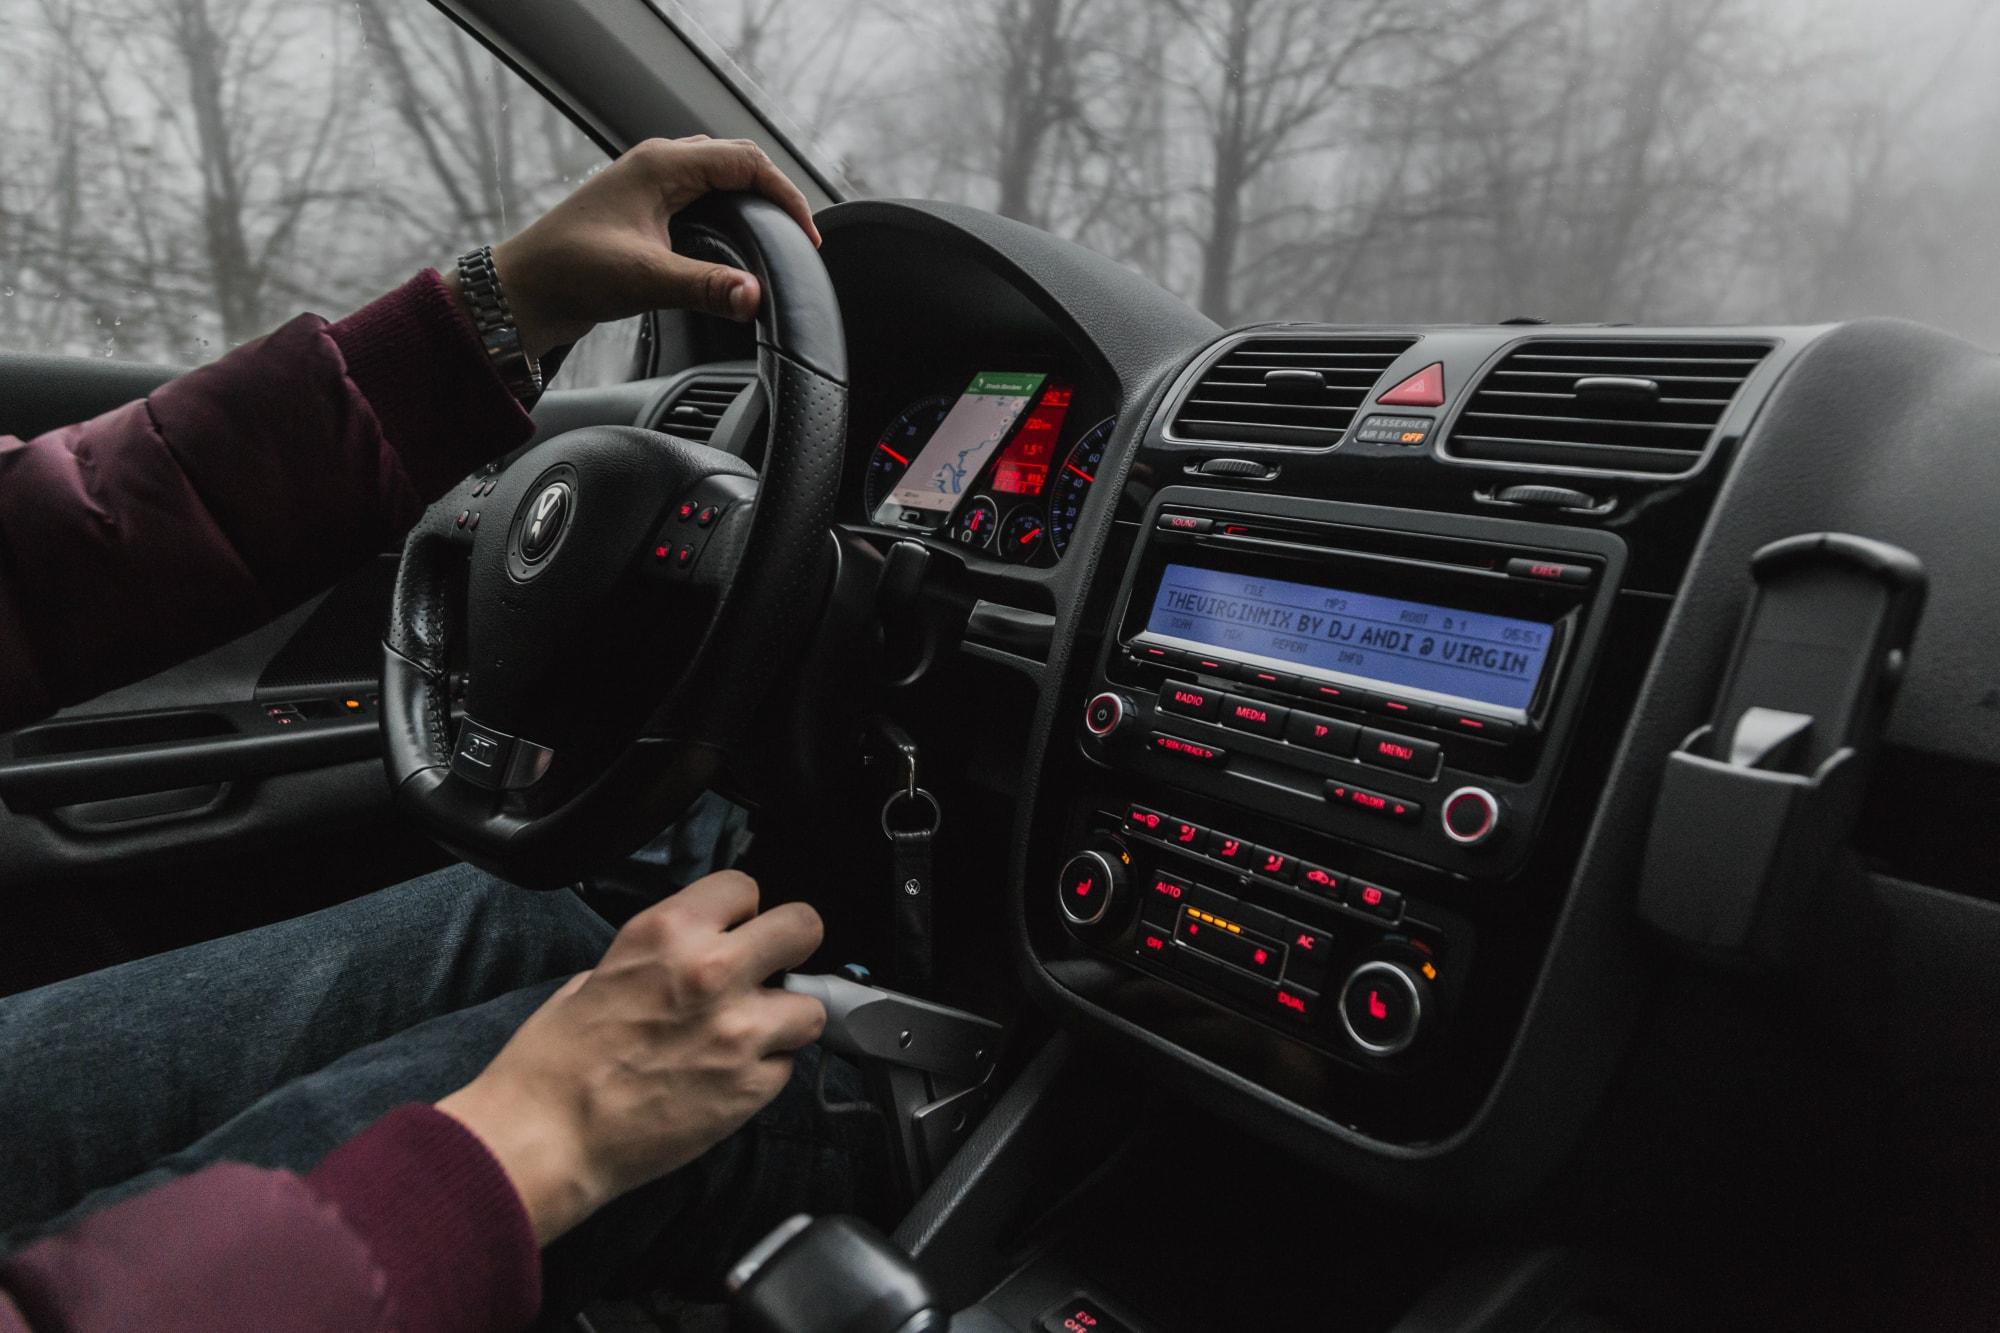 Ce dotari sunt importante la o masina si de care te poti lipsi?